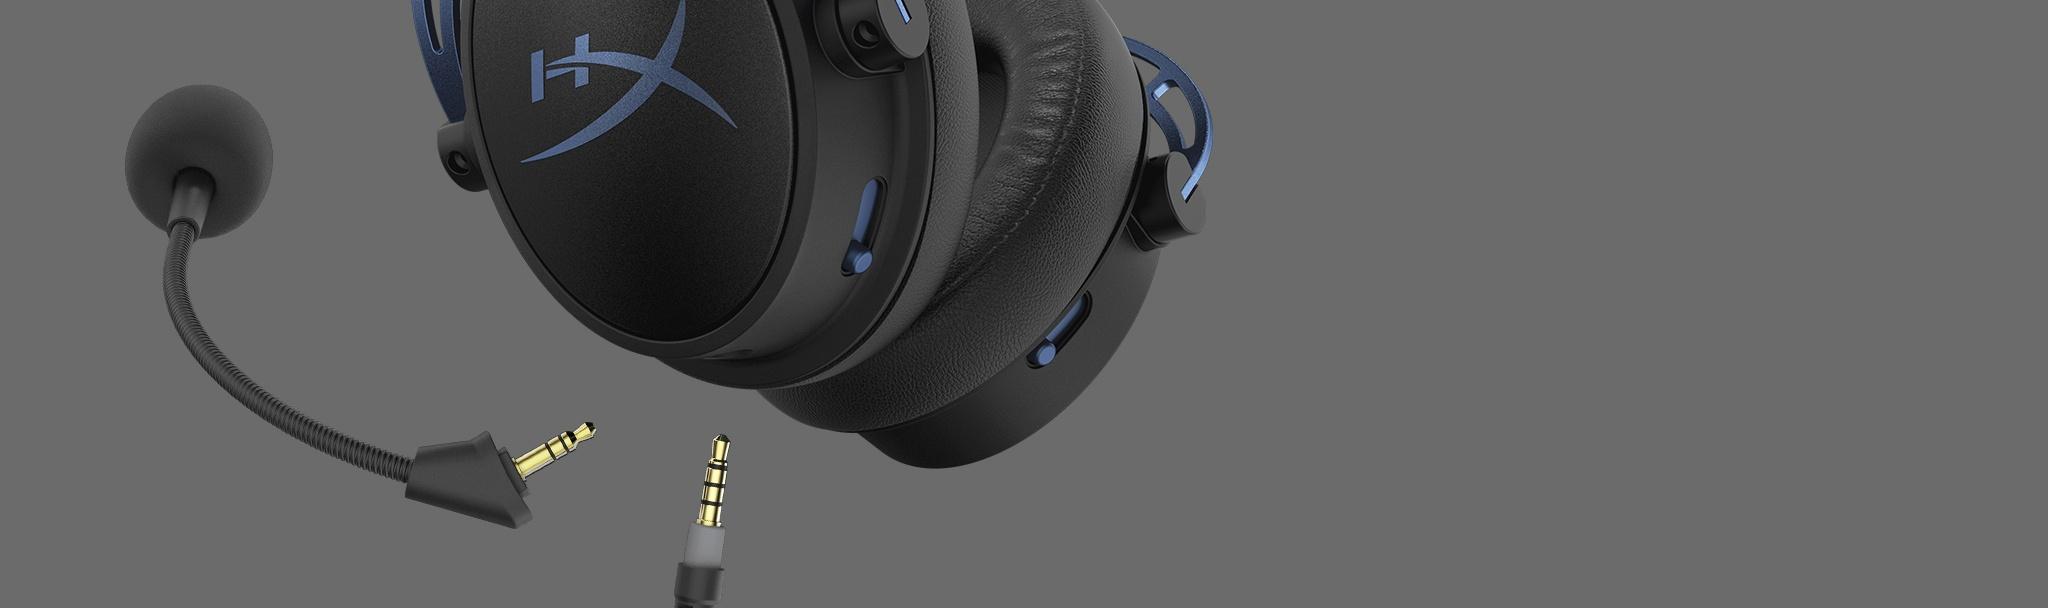 Tai nghe Kingston HyperX Cloud Alpha S Black HX-HSCAS-BK/WW trang bị dây cáp và micro tháo rời